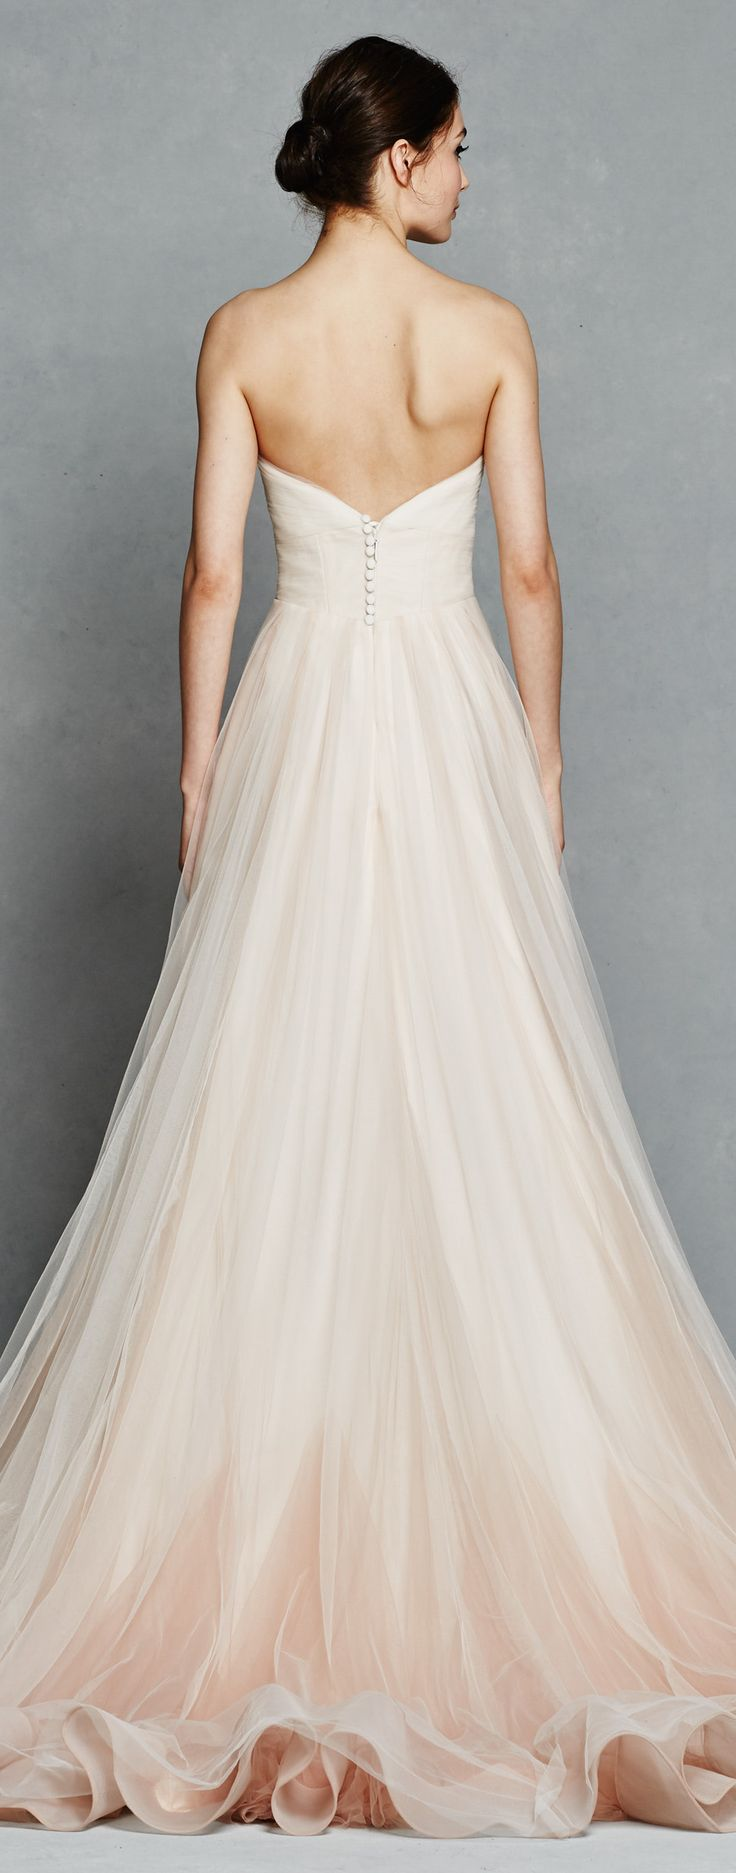 25 Cute Ombre Wedding Dress Ideas On Pinterest